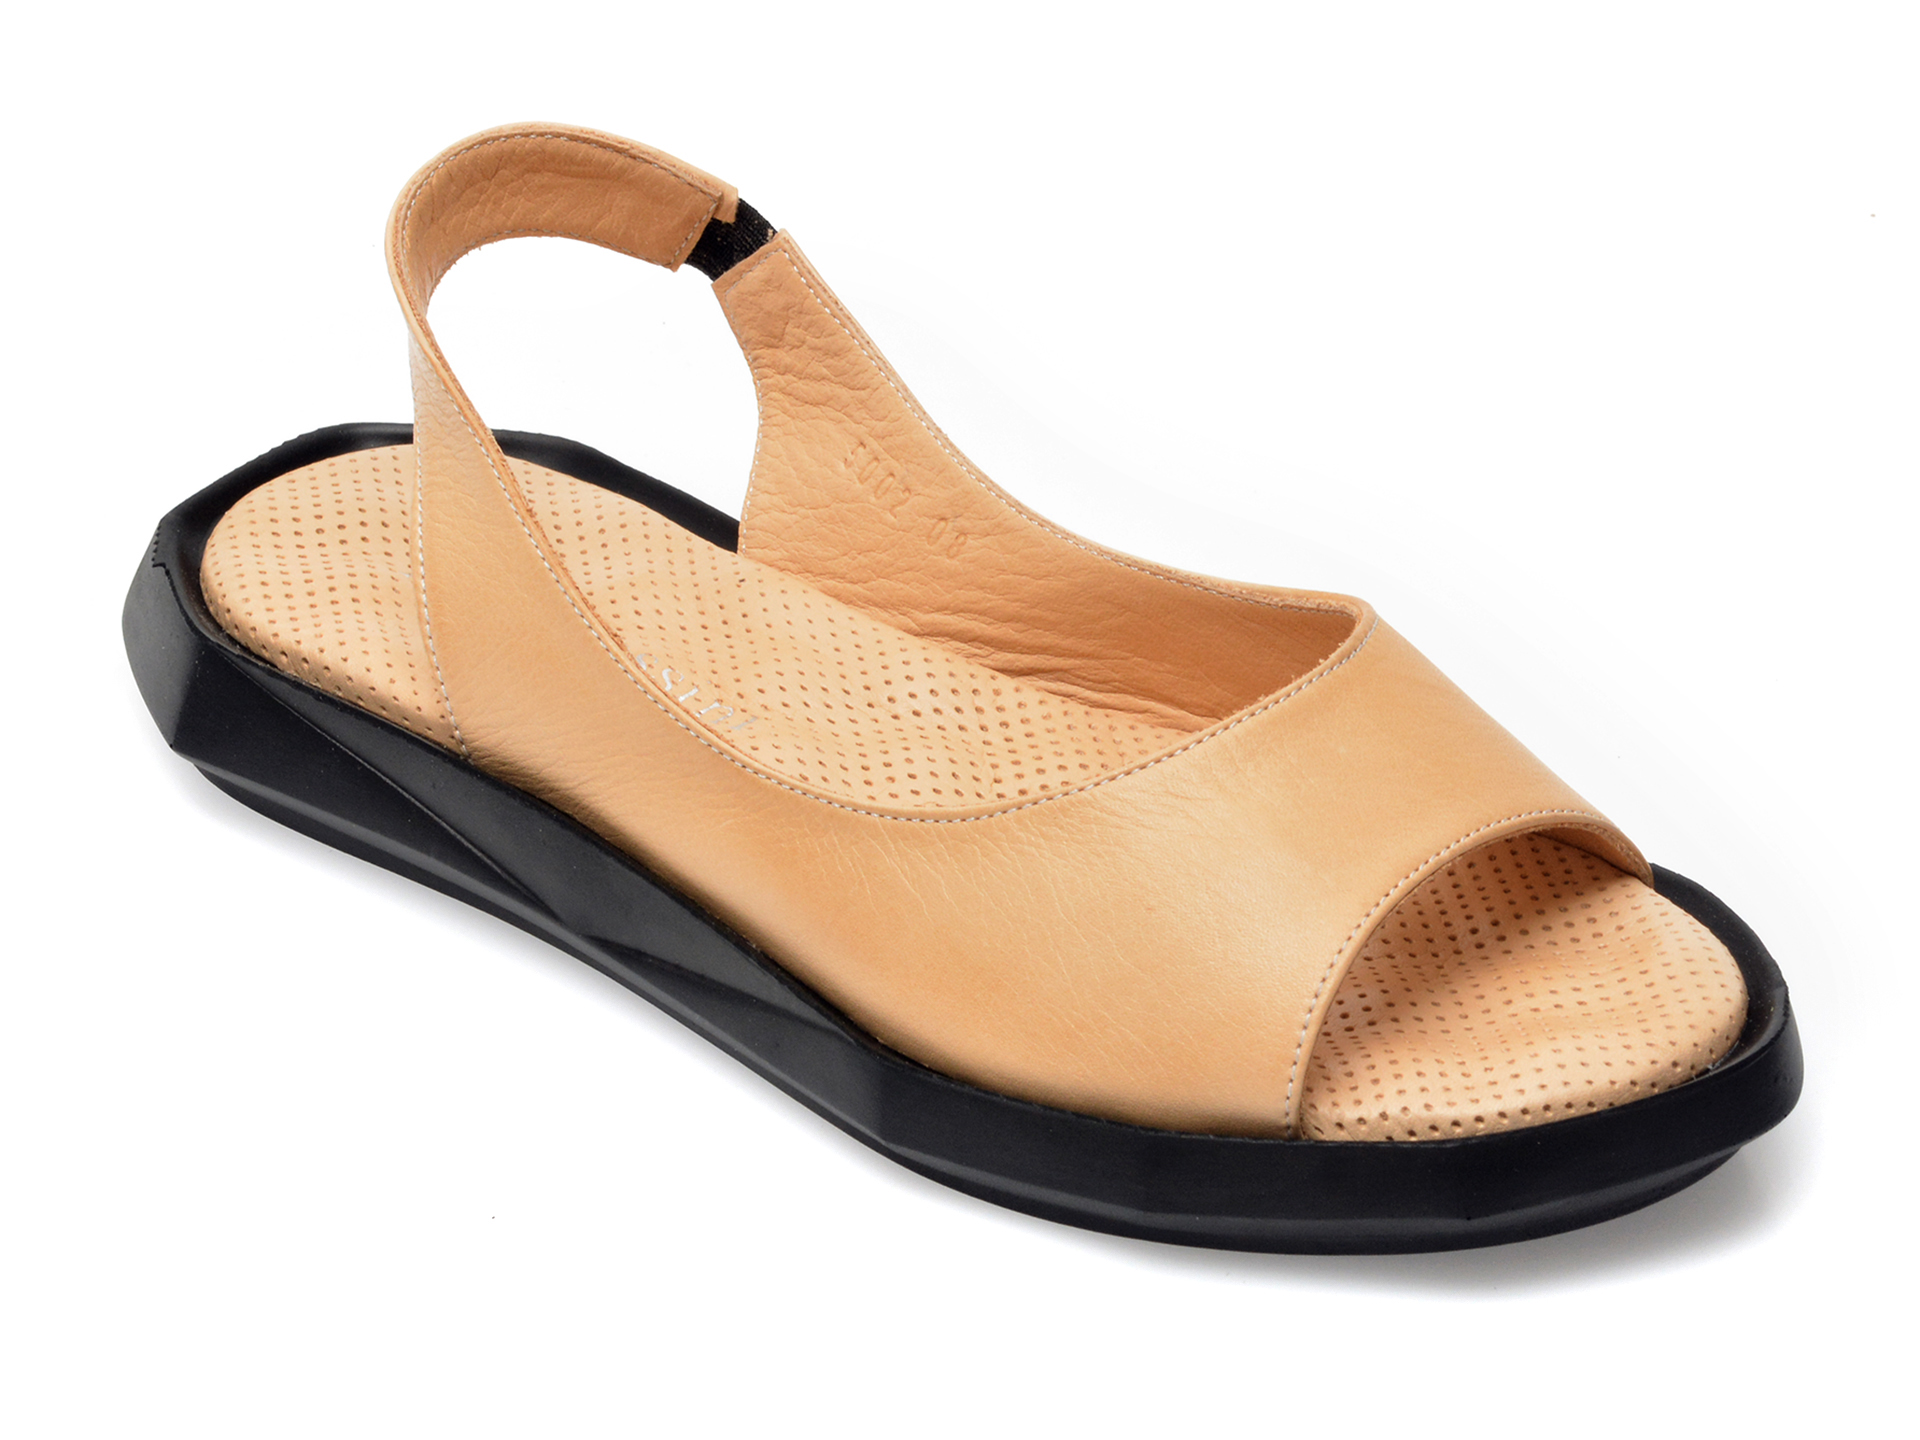 Sandale FLAVIA PASSINI bej, 705002, din piele naturala imagine otter.ro 2021